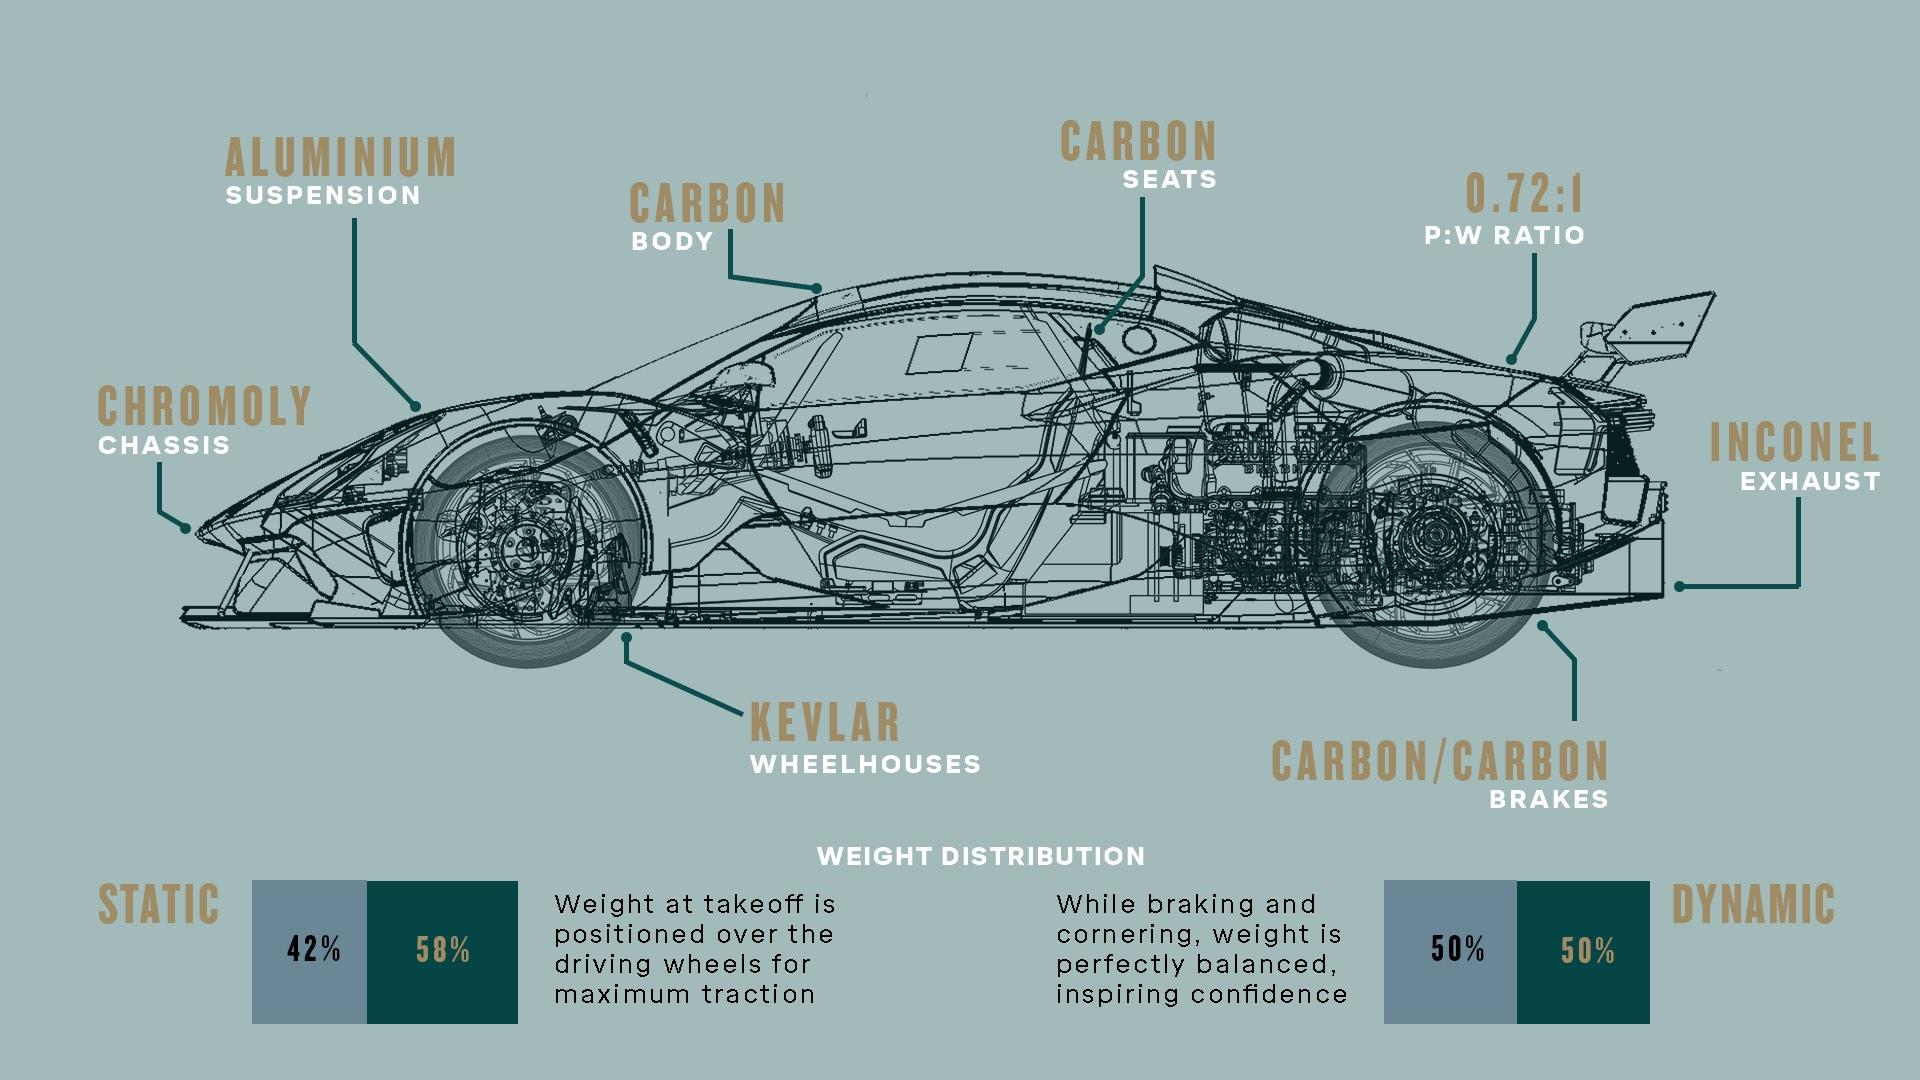 Every gram counts - the philosophy driving Brabham Automotive